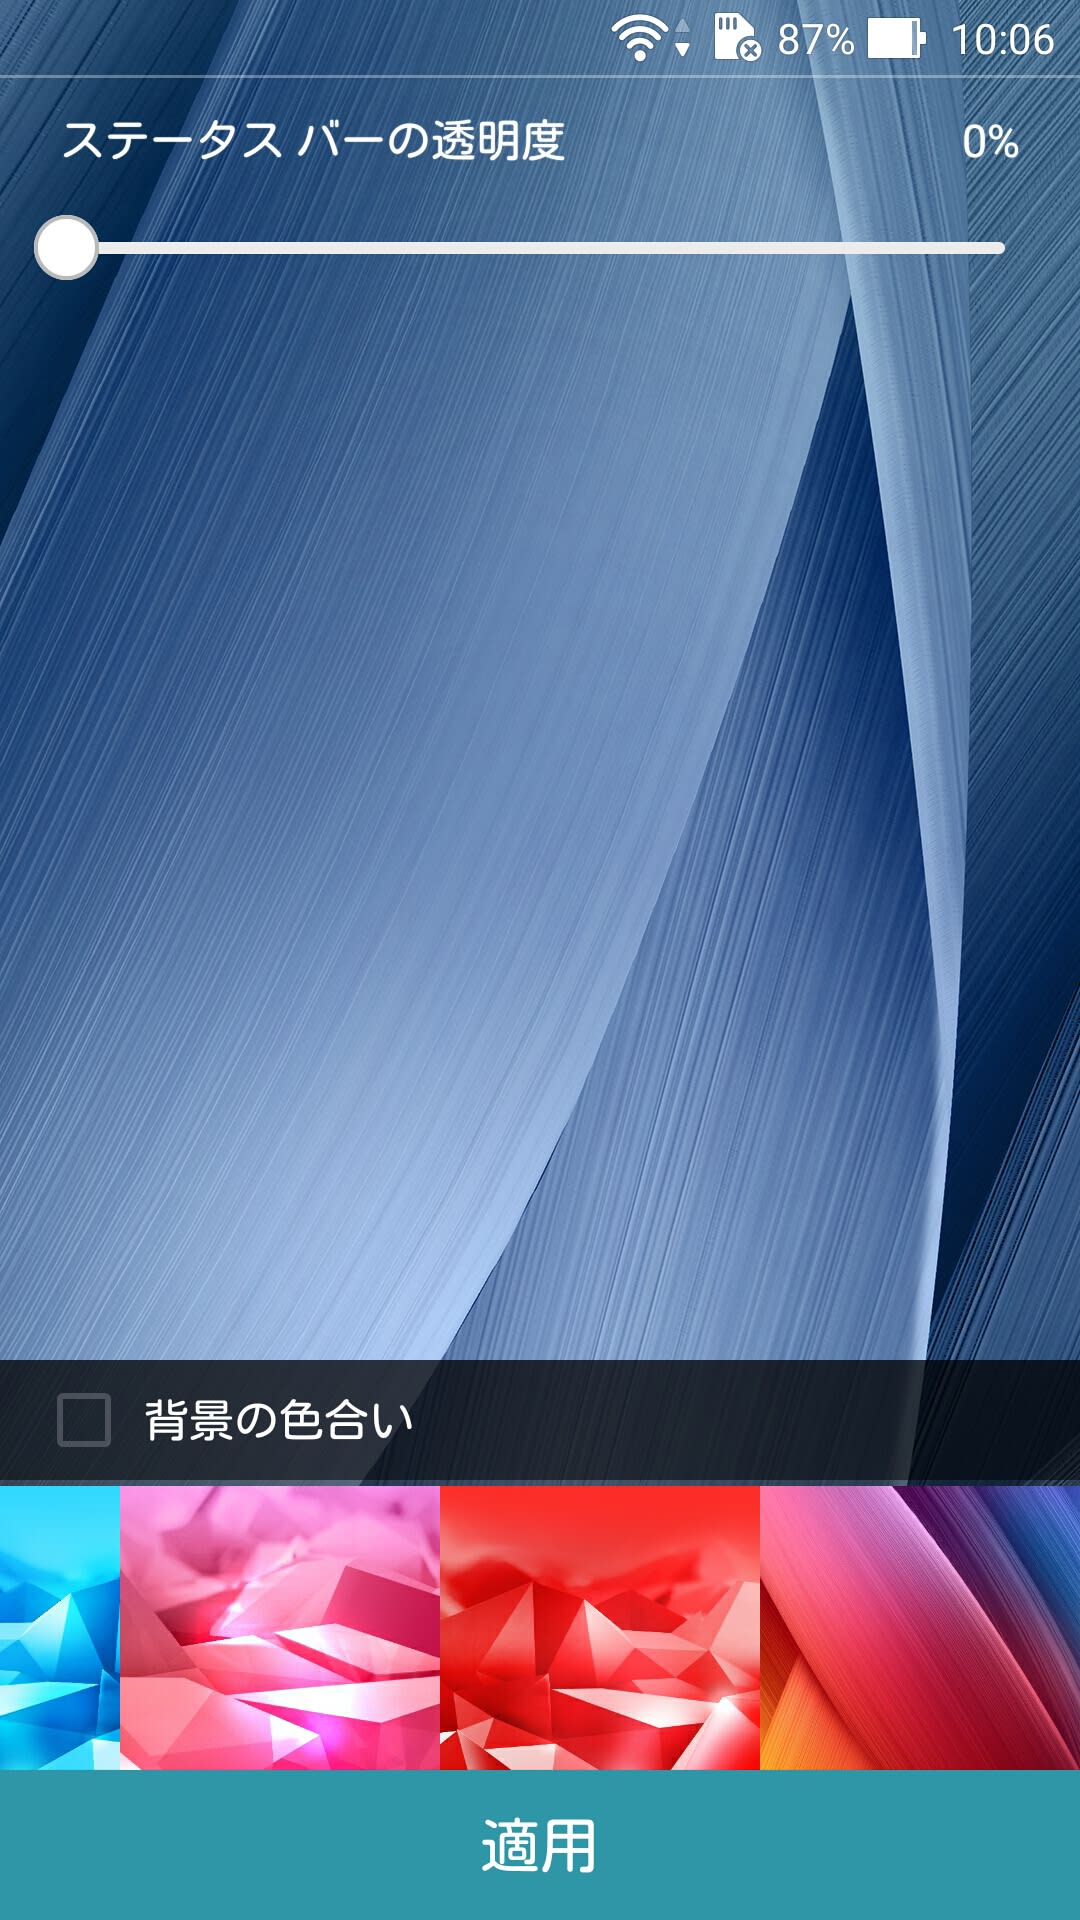 Zenfone2 のブログ記事一覧 スマホ 格安sim